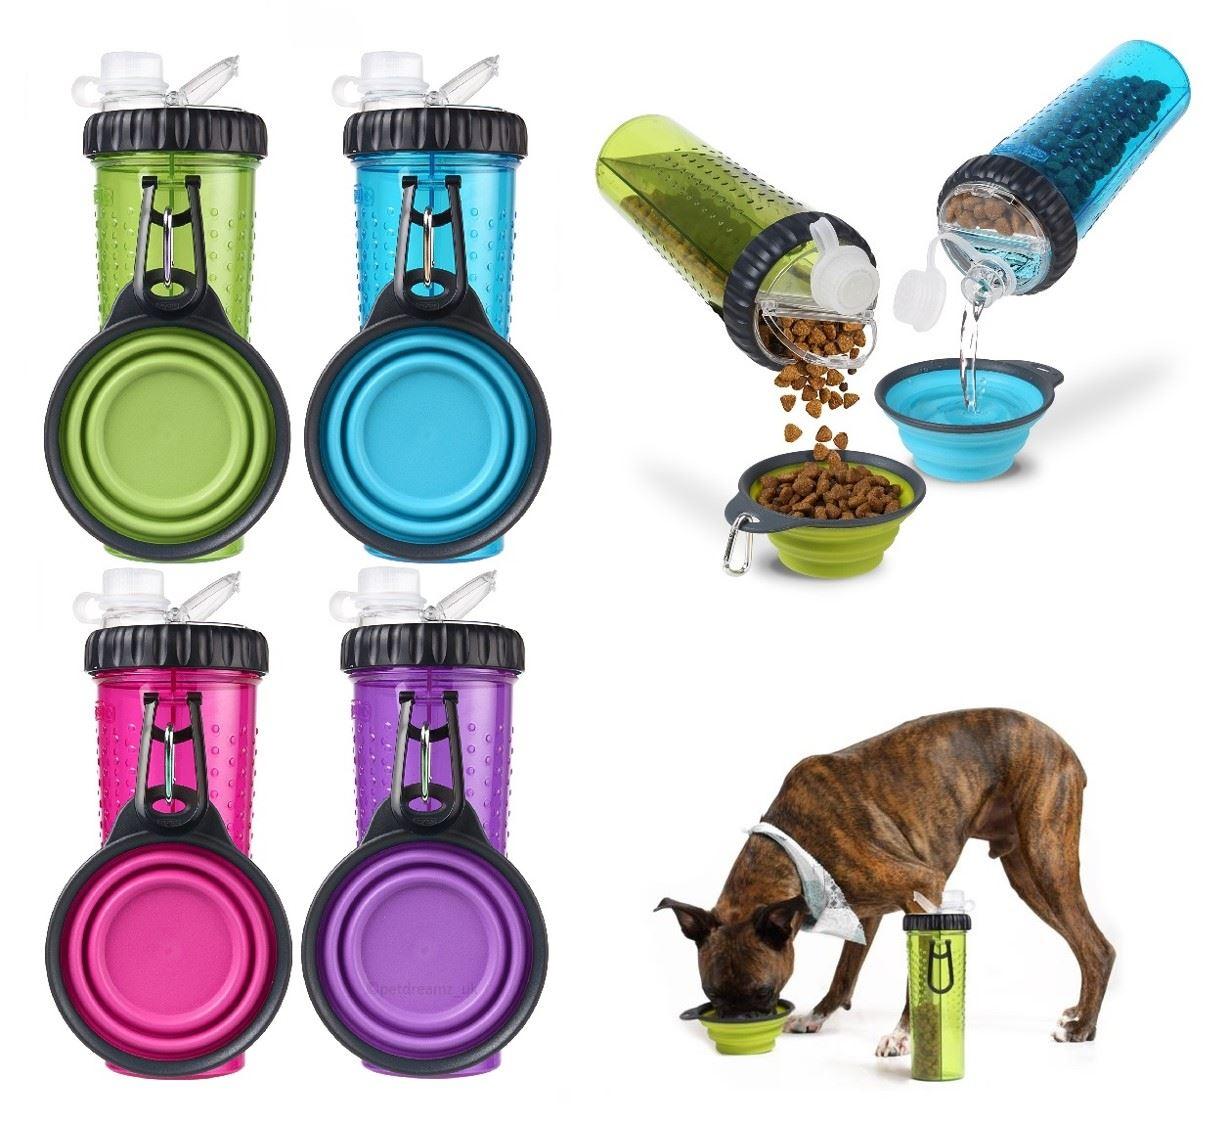 Portable Pet Travel Water Bowl Bottle Dispenser Feeder Cat: Dexas Popware Snack-DuO Portable Travel Pet Dog Puppy Food